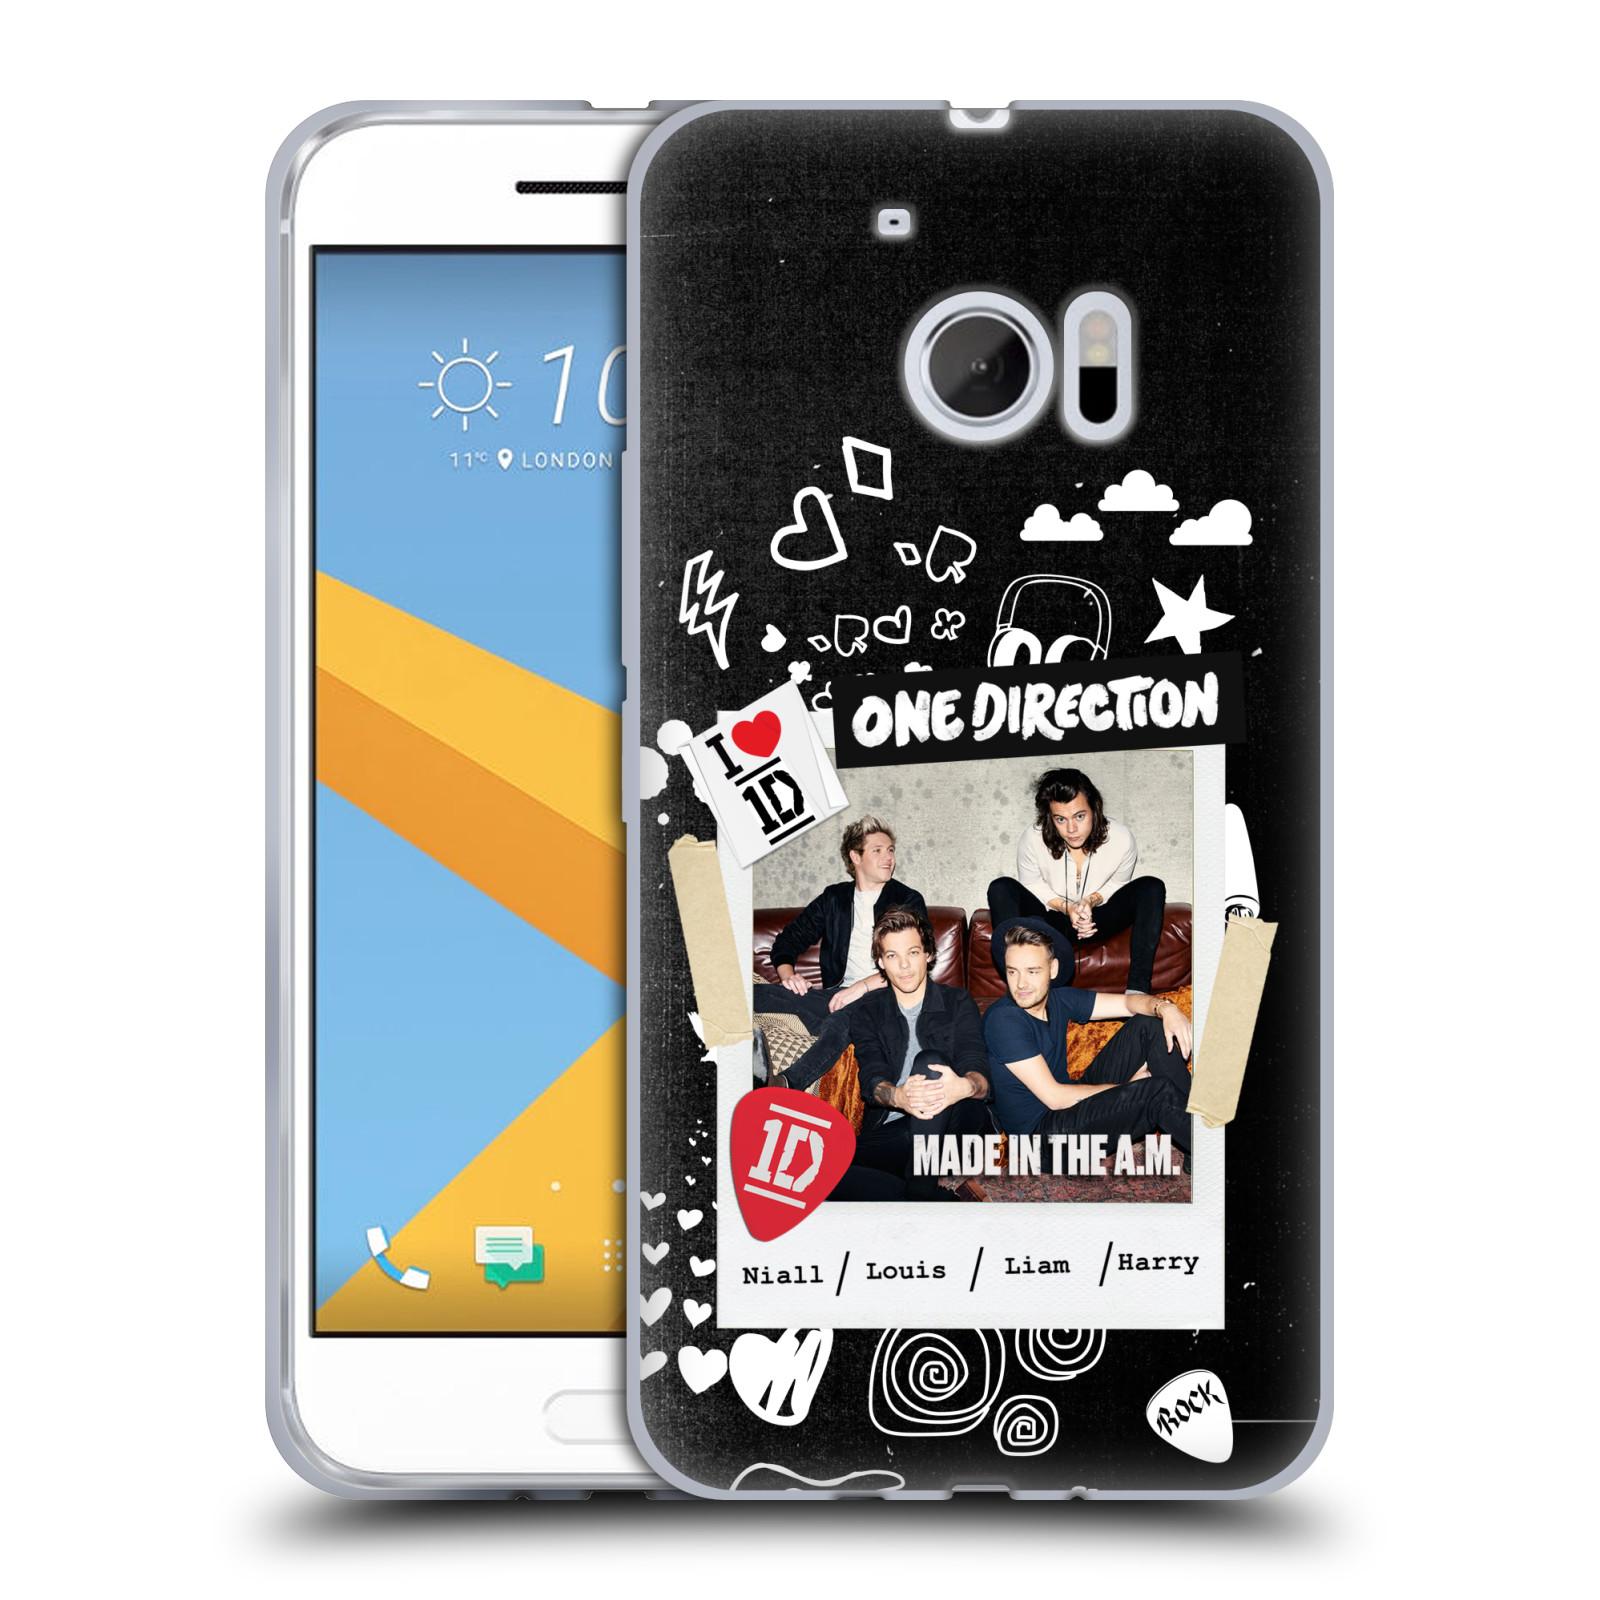 Silikonové pouzdro na mobil HTC 10 HEAD CASE One Direction - S kytárou (Silikonový kryt či obal One Direction Official na mobilní telefon HTC 10 (HTC One M10))